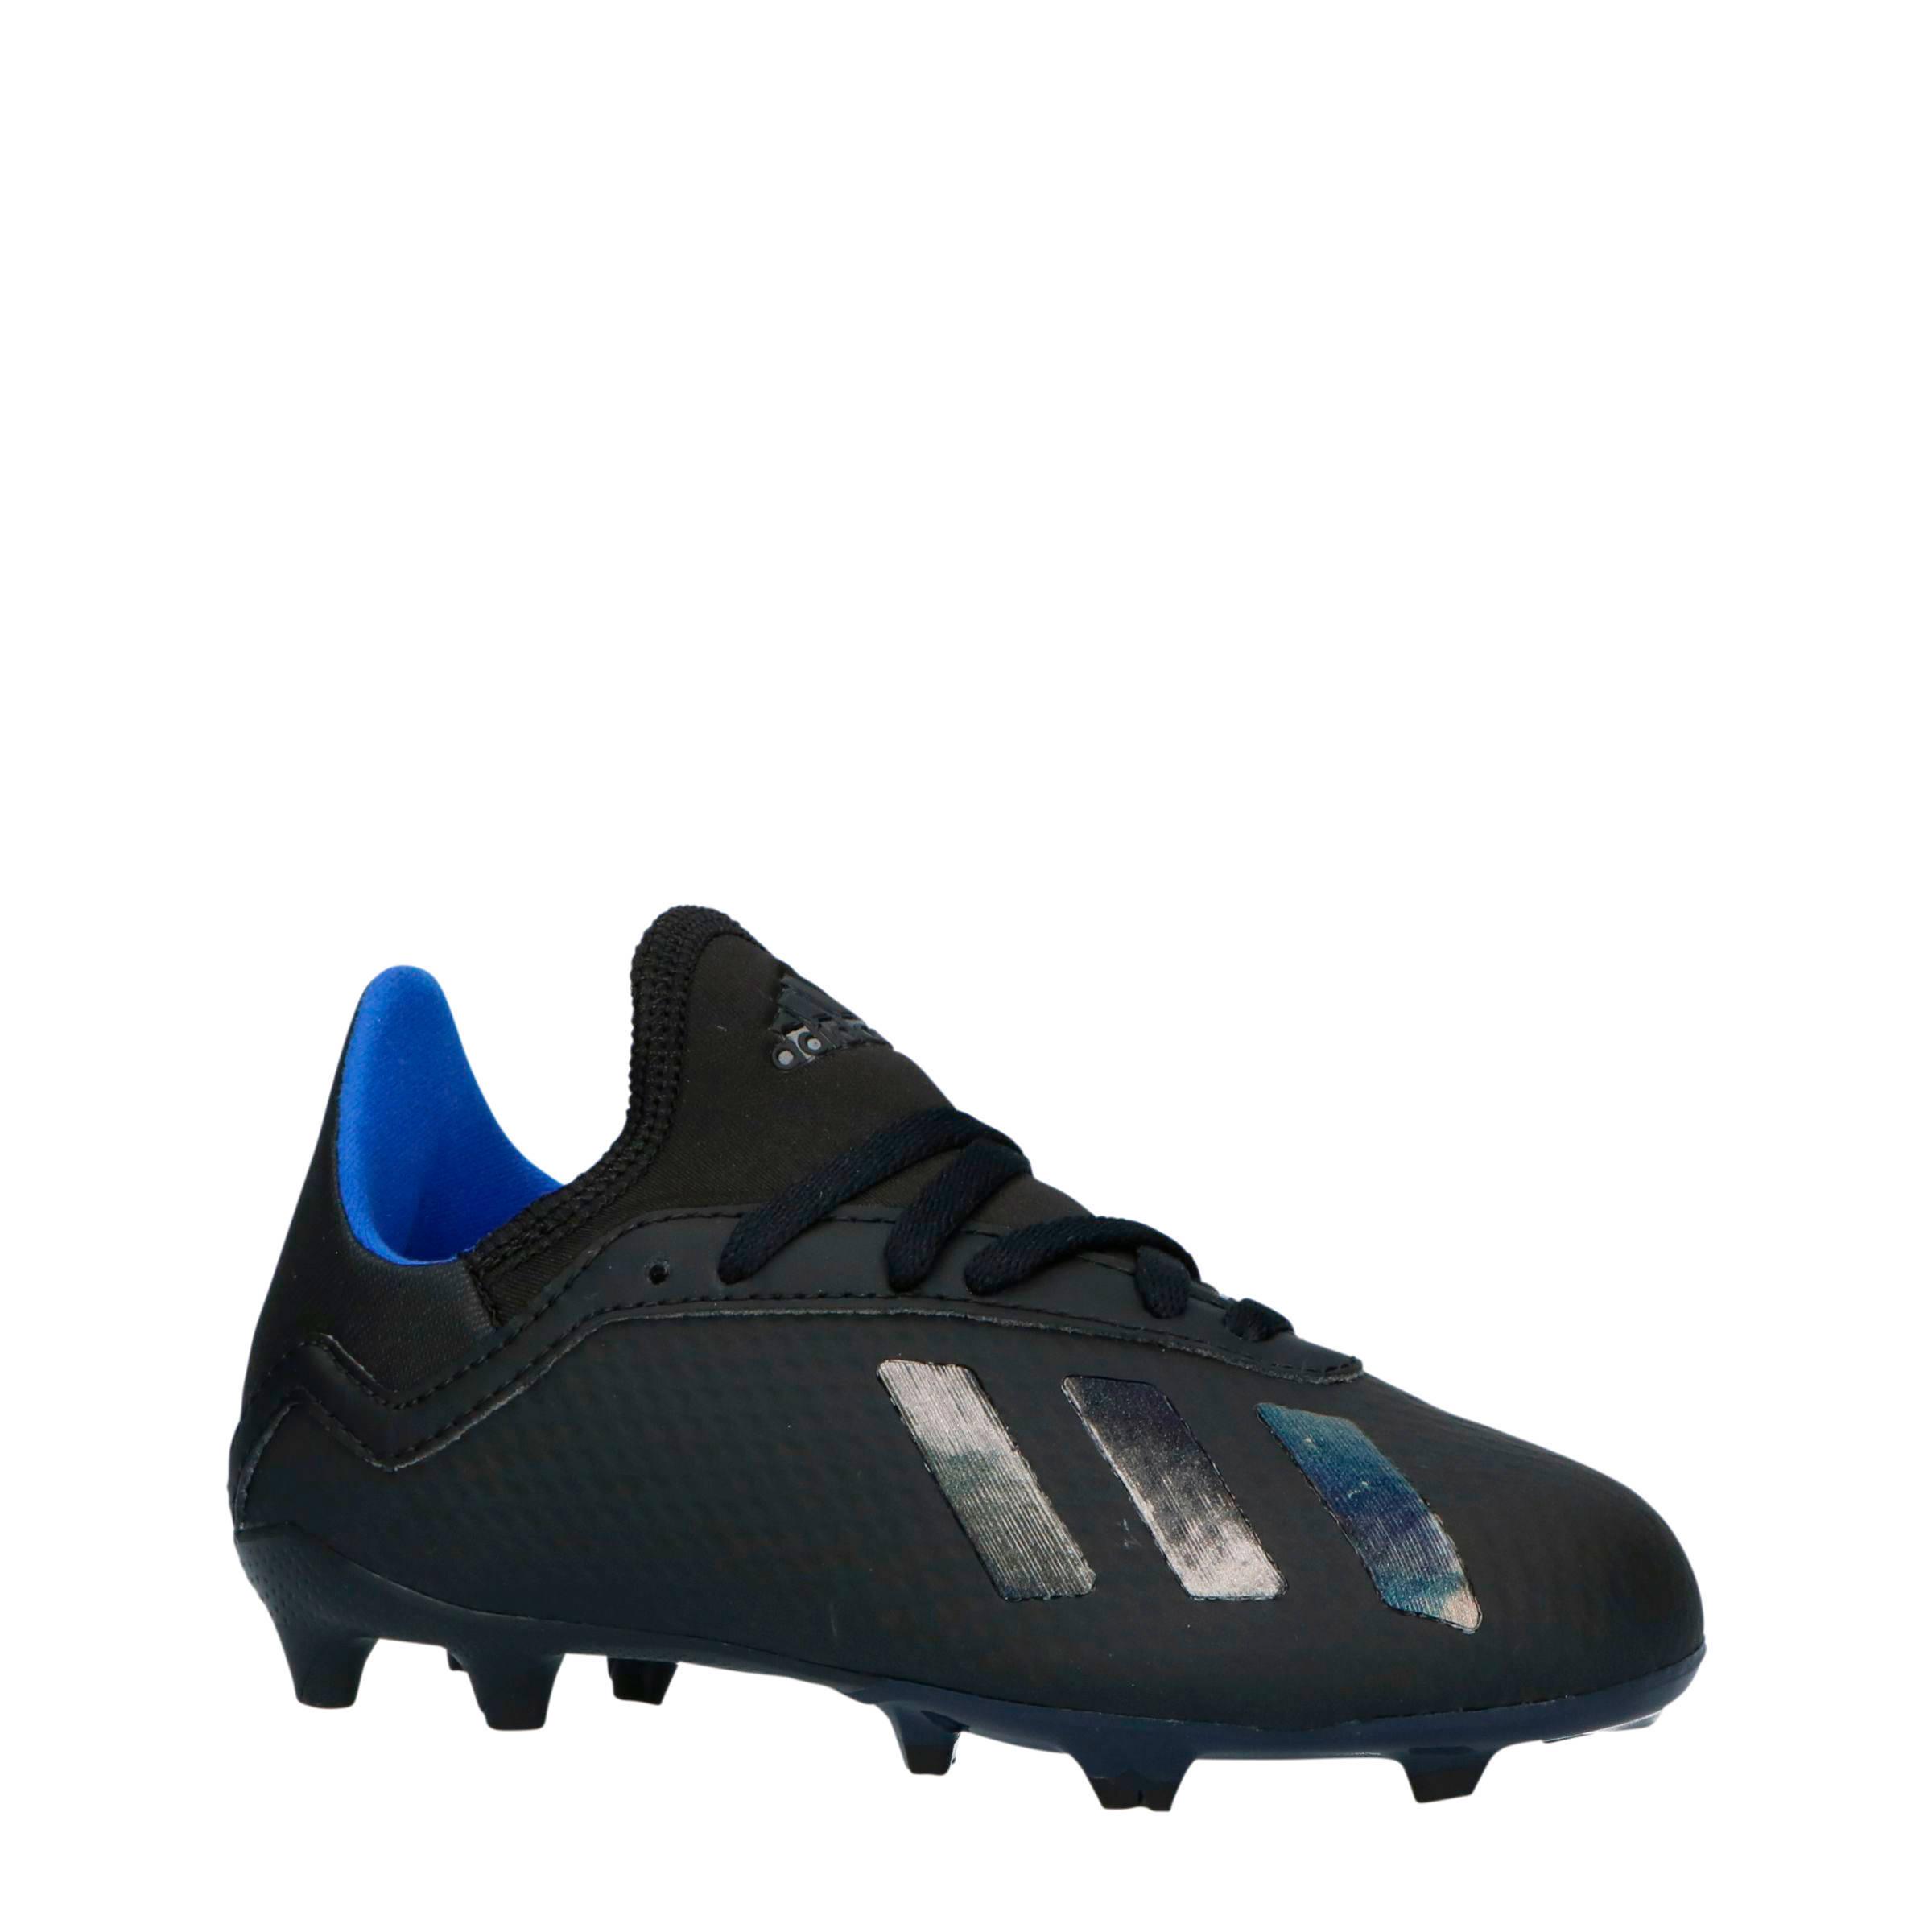 ZwartblauwWehkamp X Adidas Voetbalschoenen Fg Performance 3 J 18 R35LAq4j